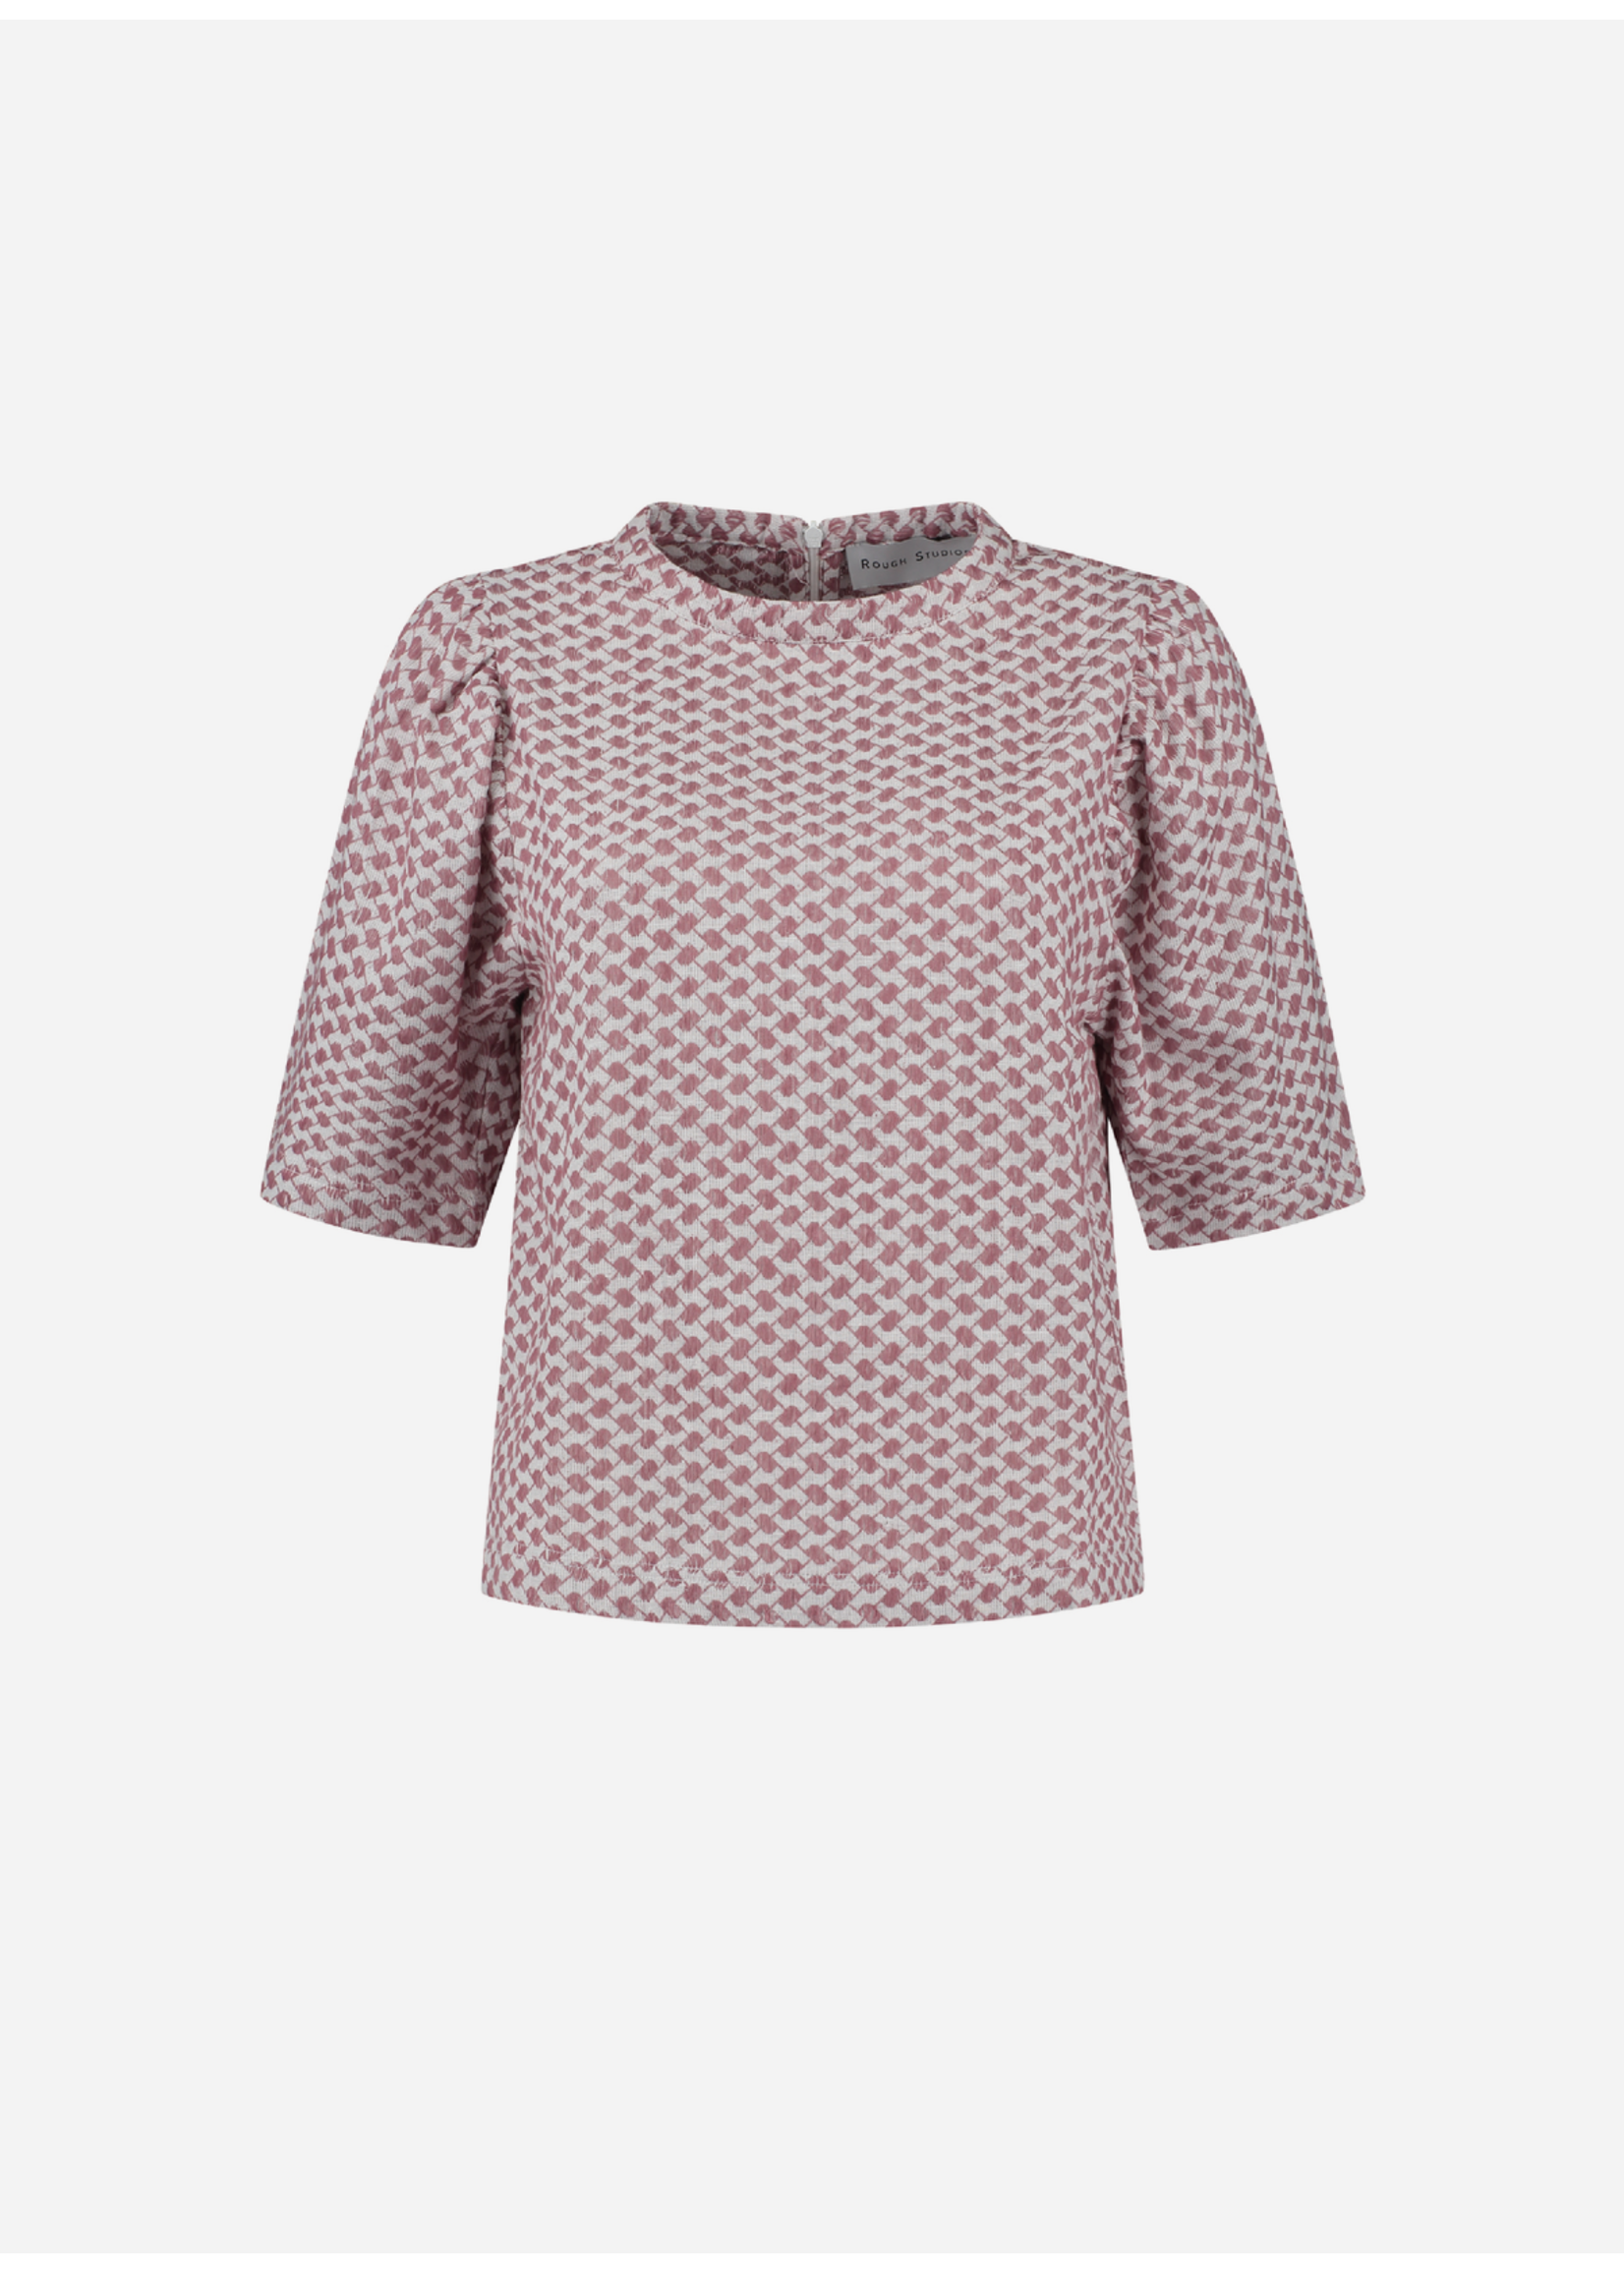 Rough Studios Simone shirt pink/white